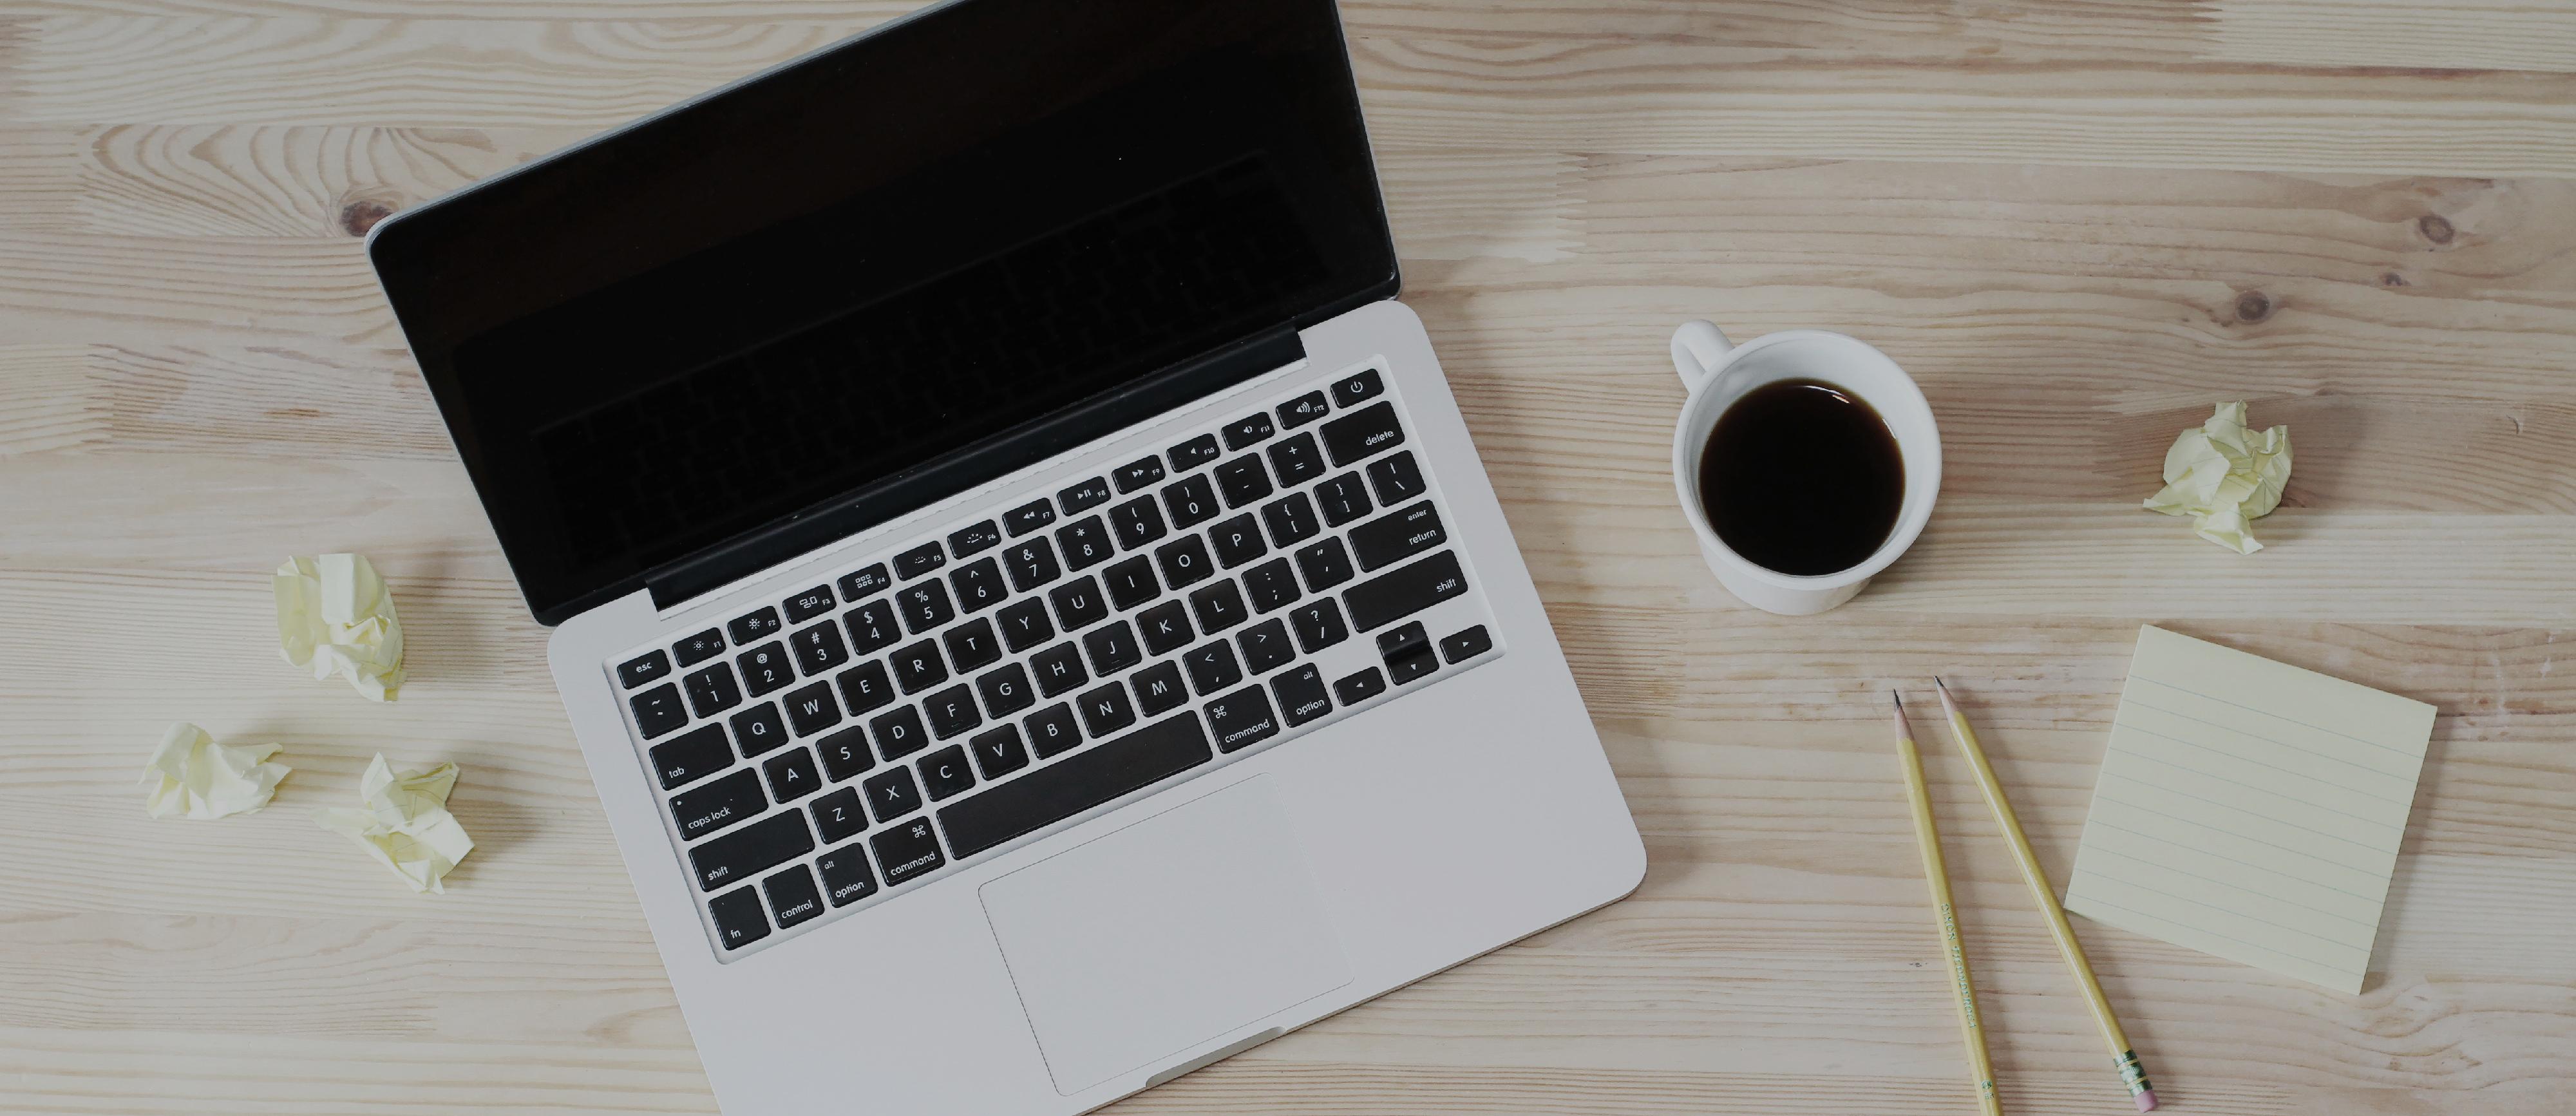 5 Steps to Kickstart Your Digital Marketing